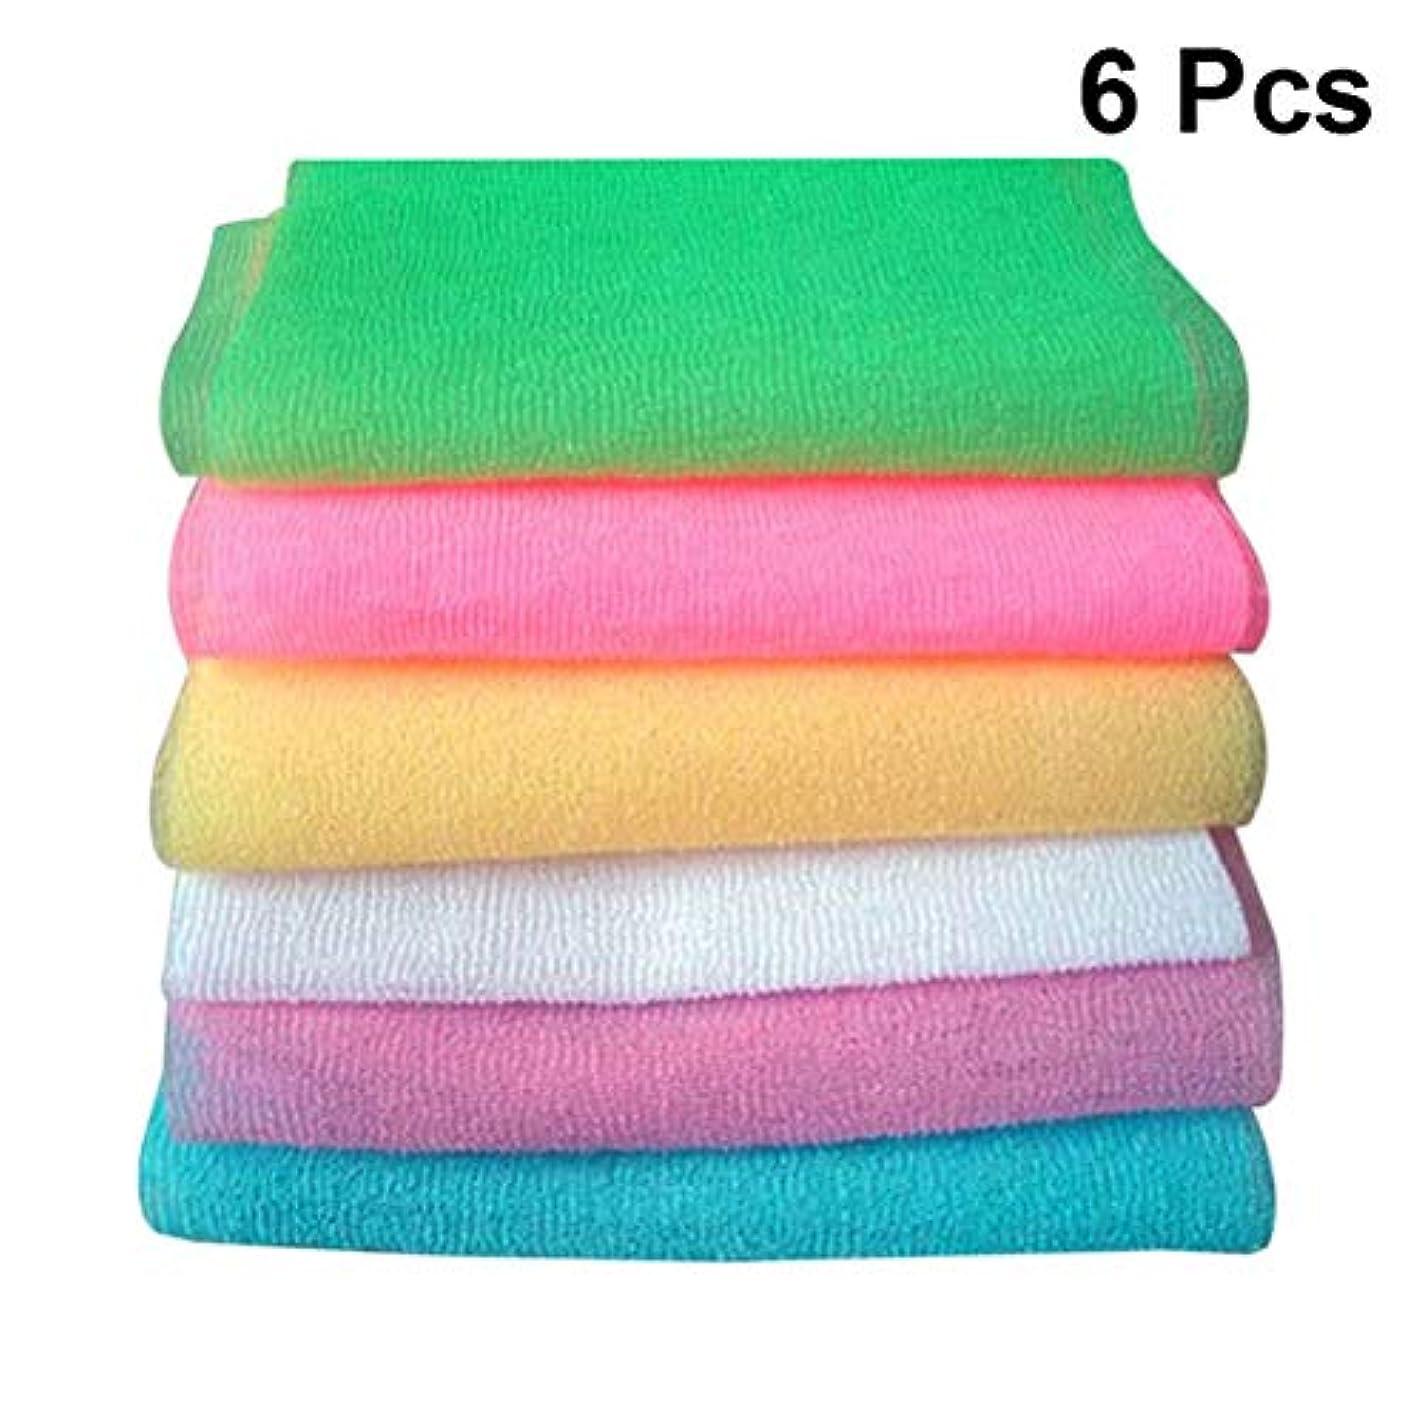 Healifty 6本のバスタオルこすりタオルこすりバックスクラブロングストリップシャワータオル(混合パターン)